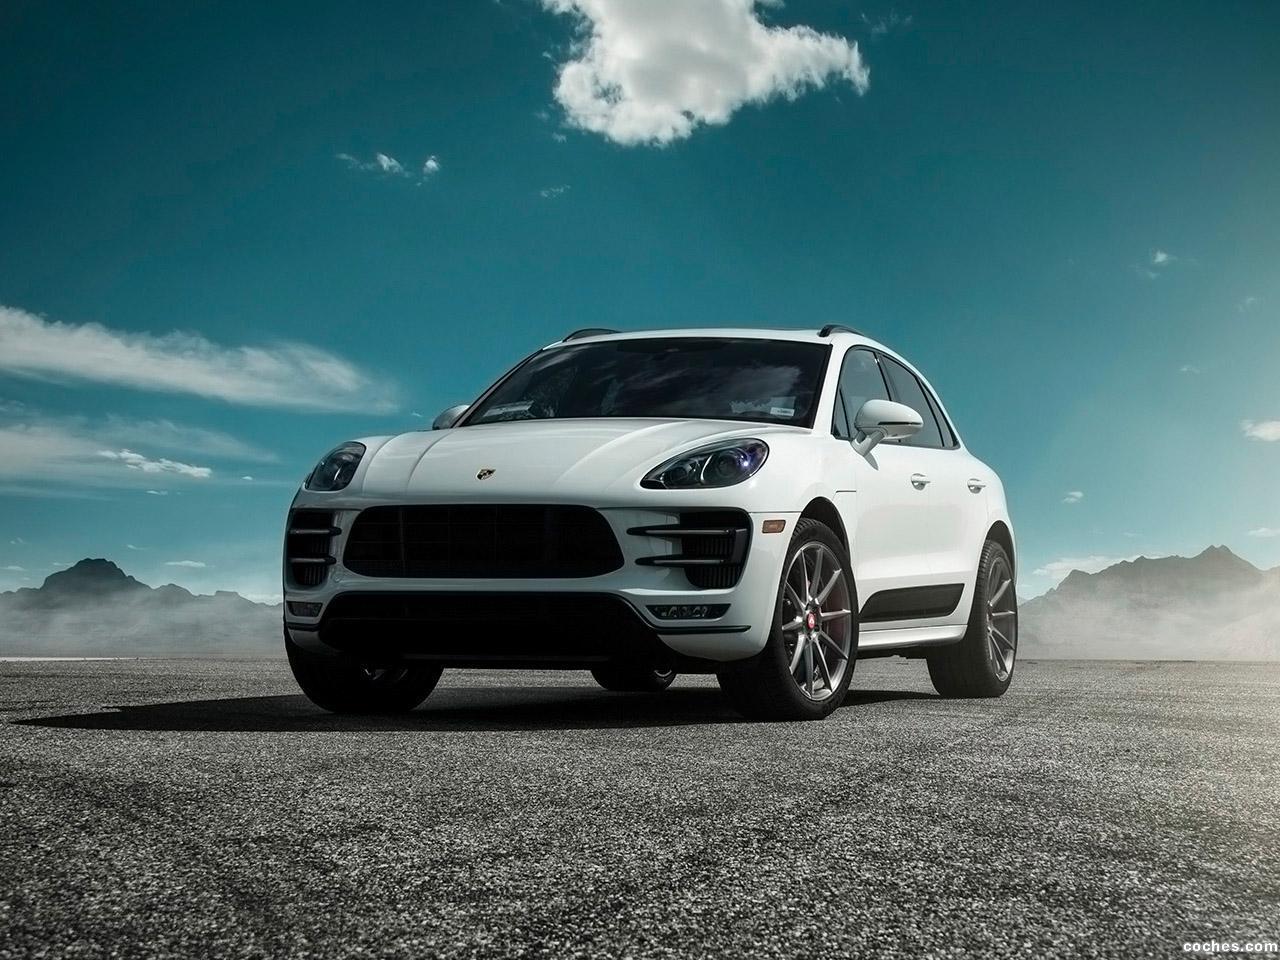 Foto 0 de Vorsteiner Porsche Macan V-200 2015